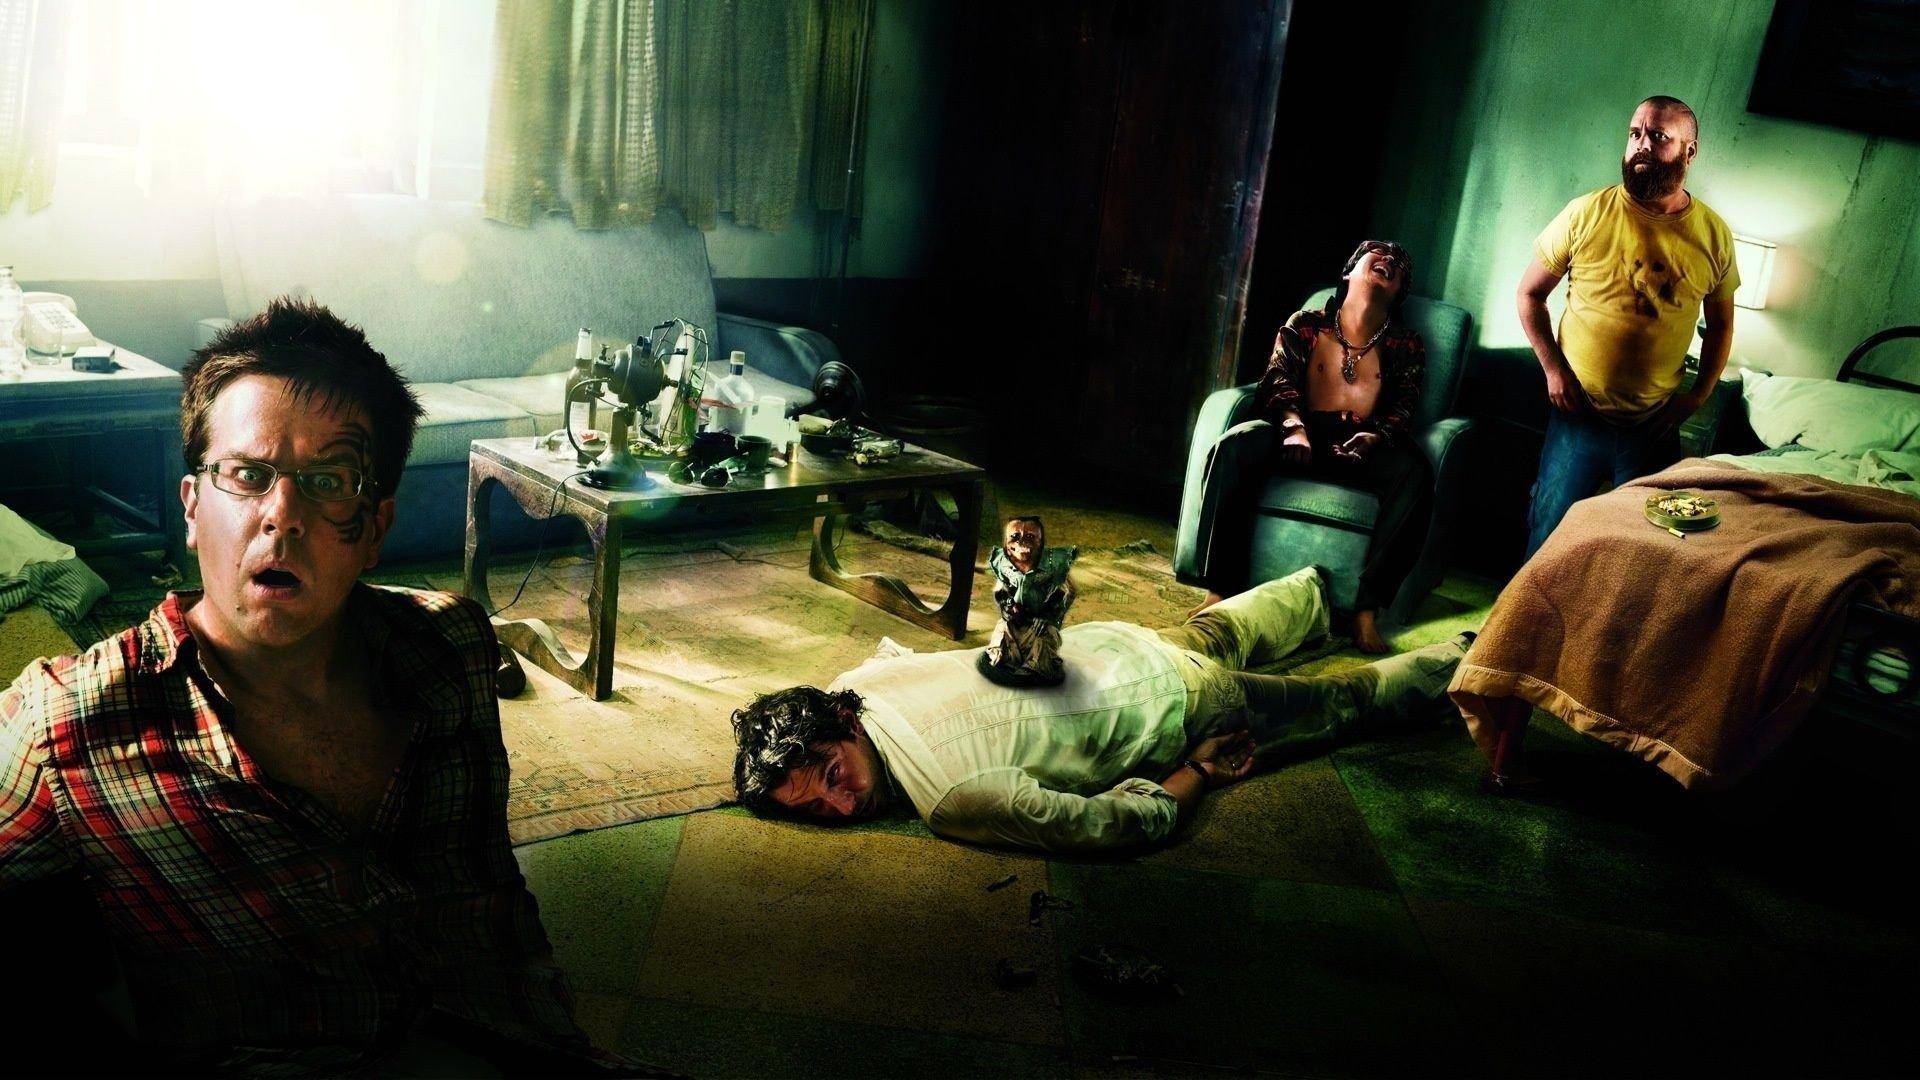 Movie - The Hangover  Ed Helms Zach Galifianakis Ken Jeong Bradley Cooper Wallpaper